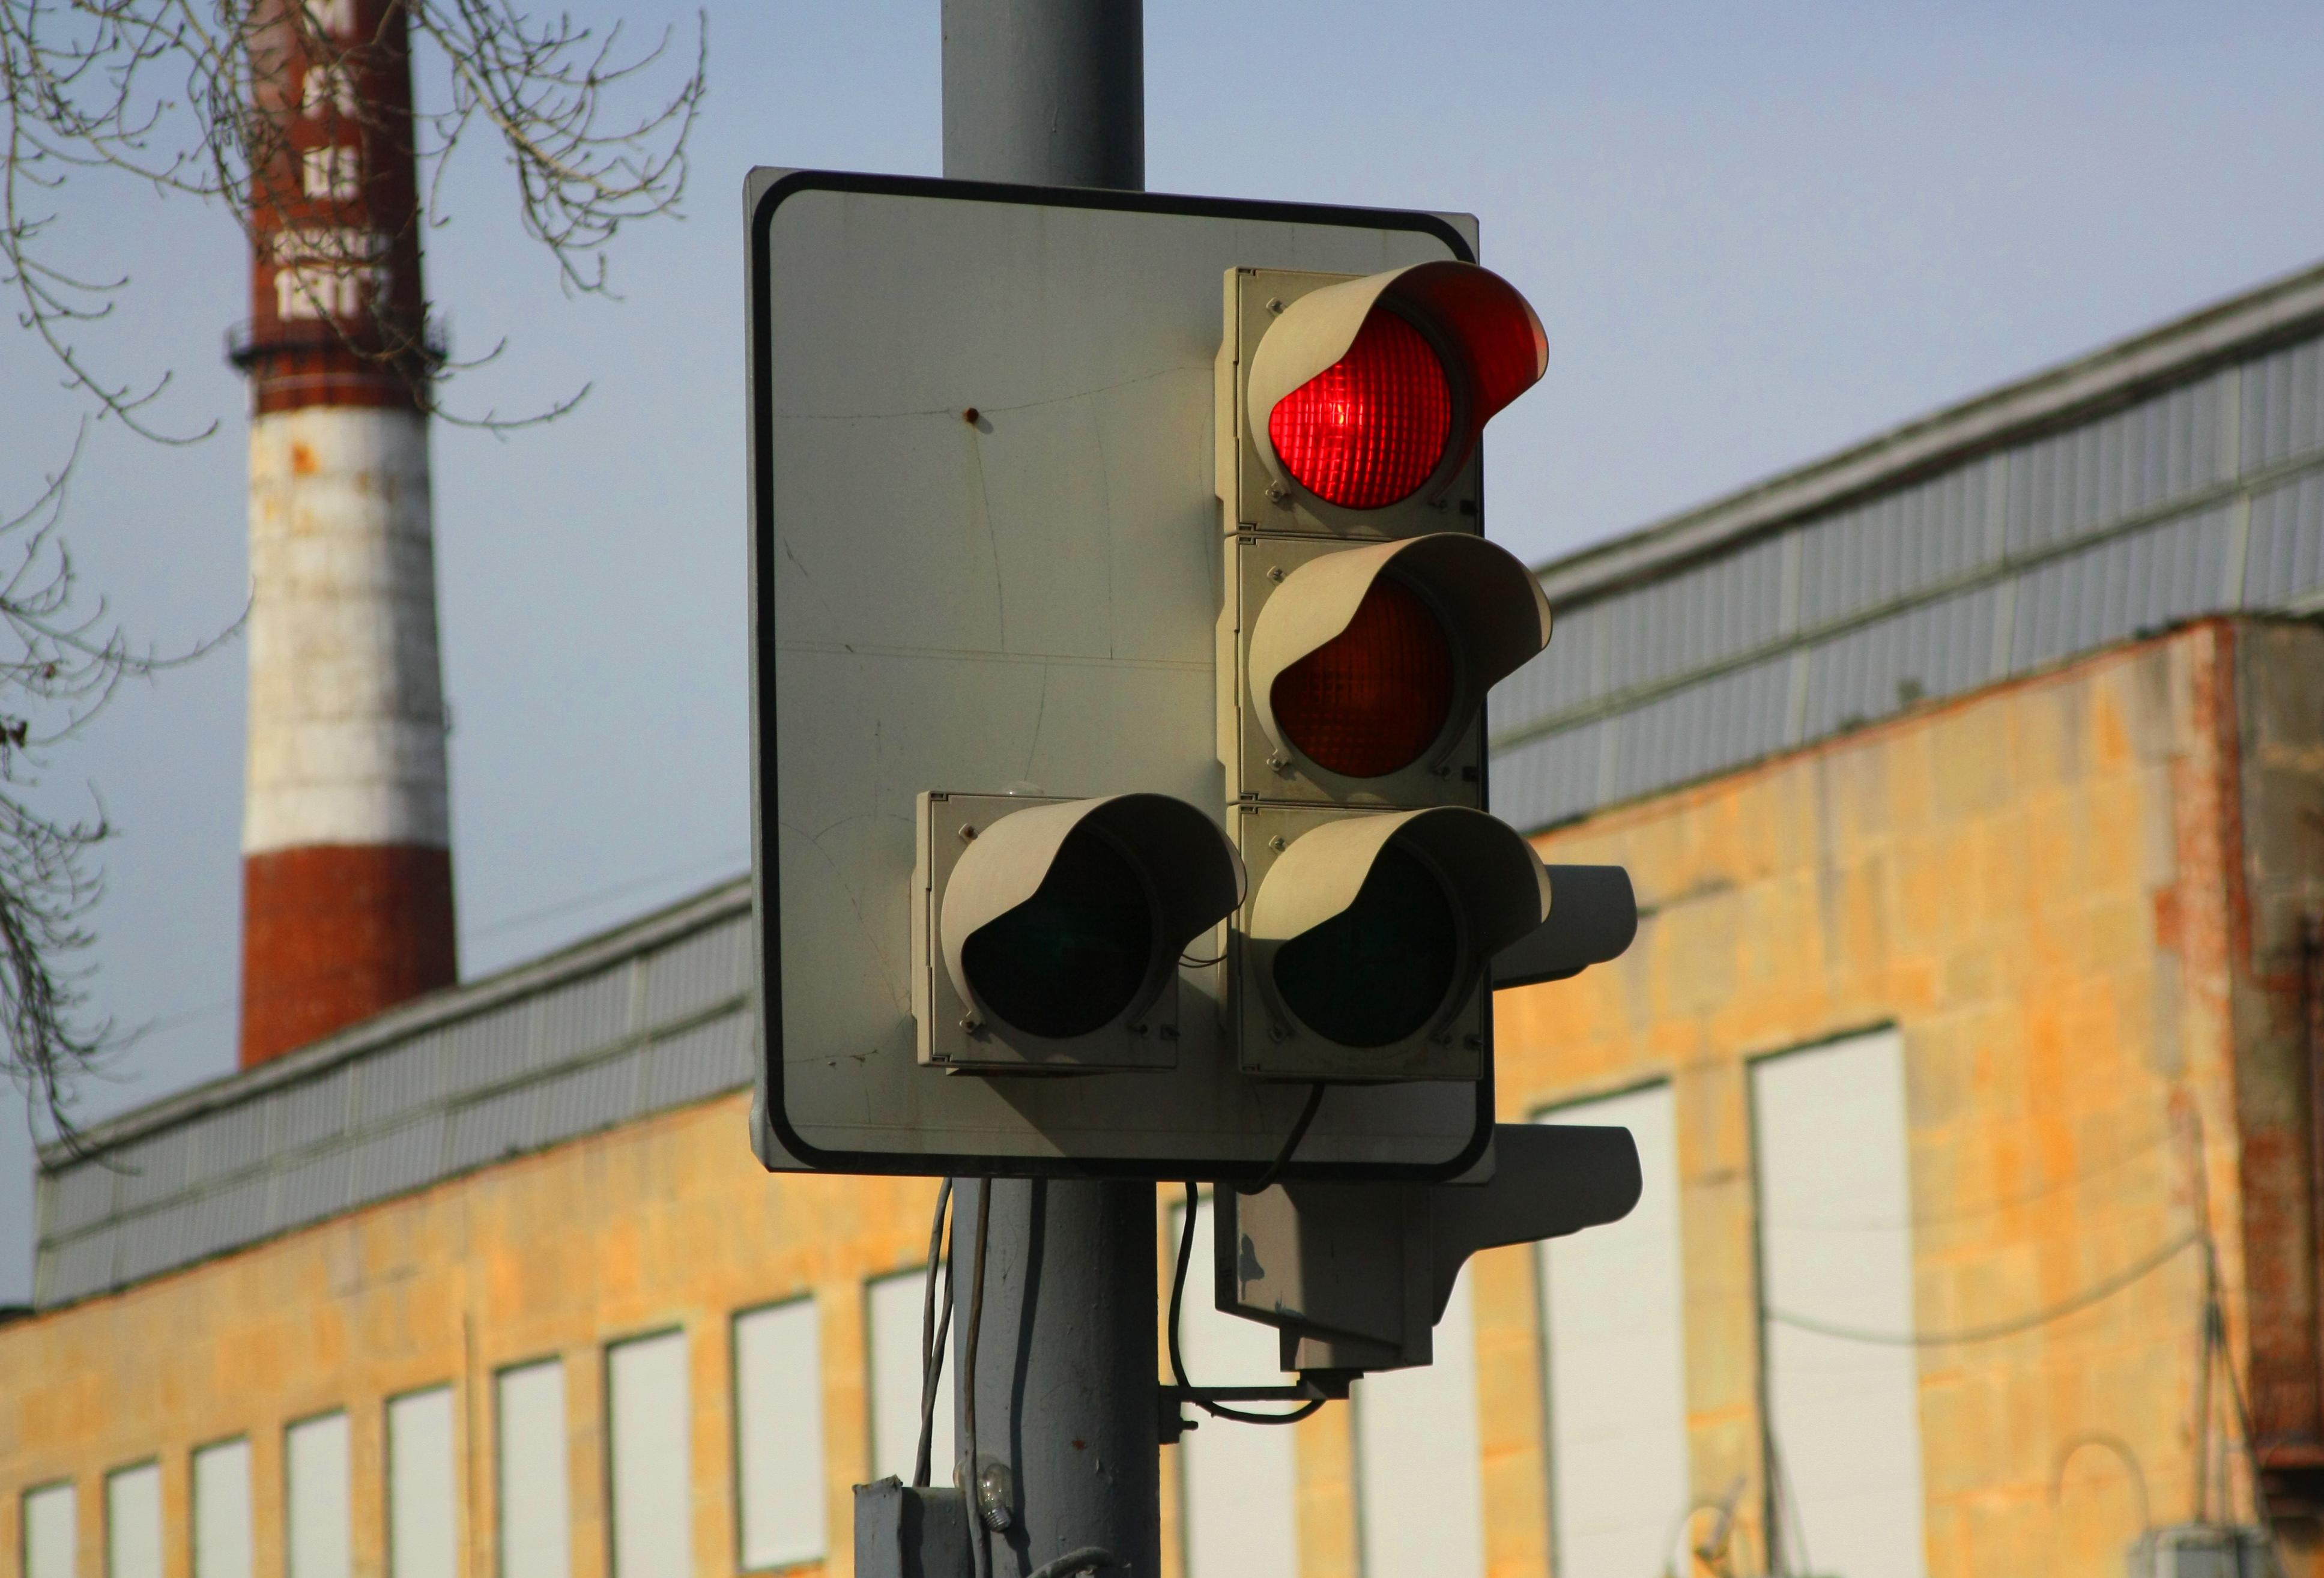 Светофоры Екатеринбурга научат адаптироваться под трафик